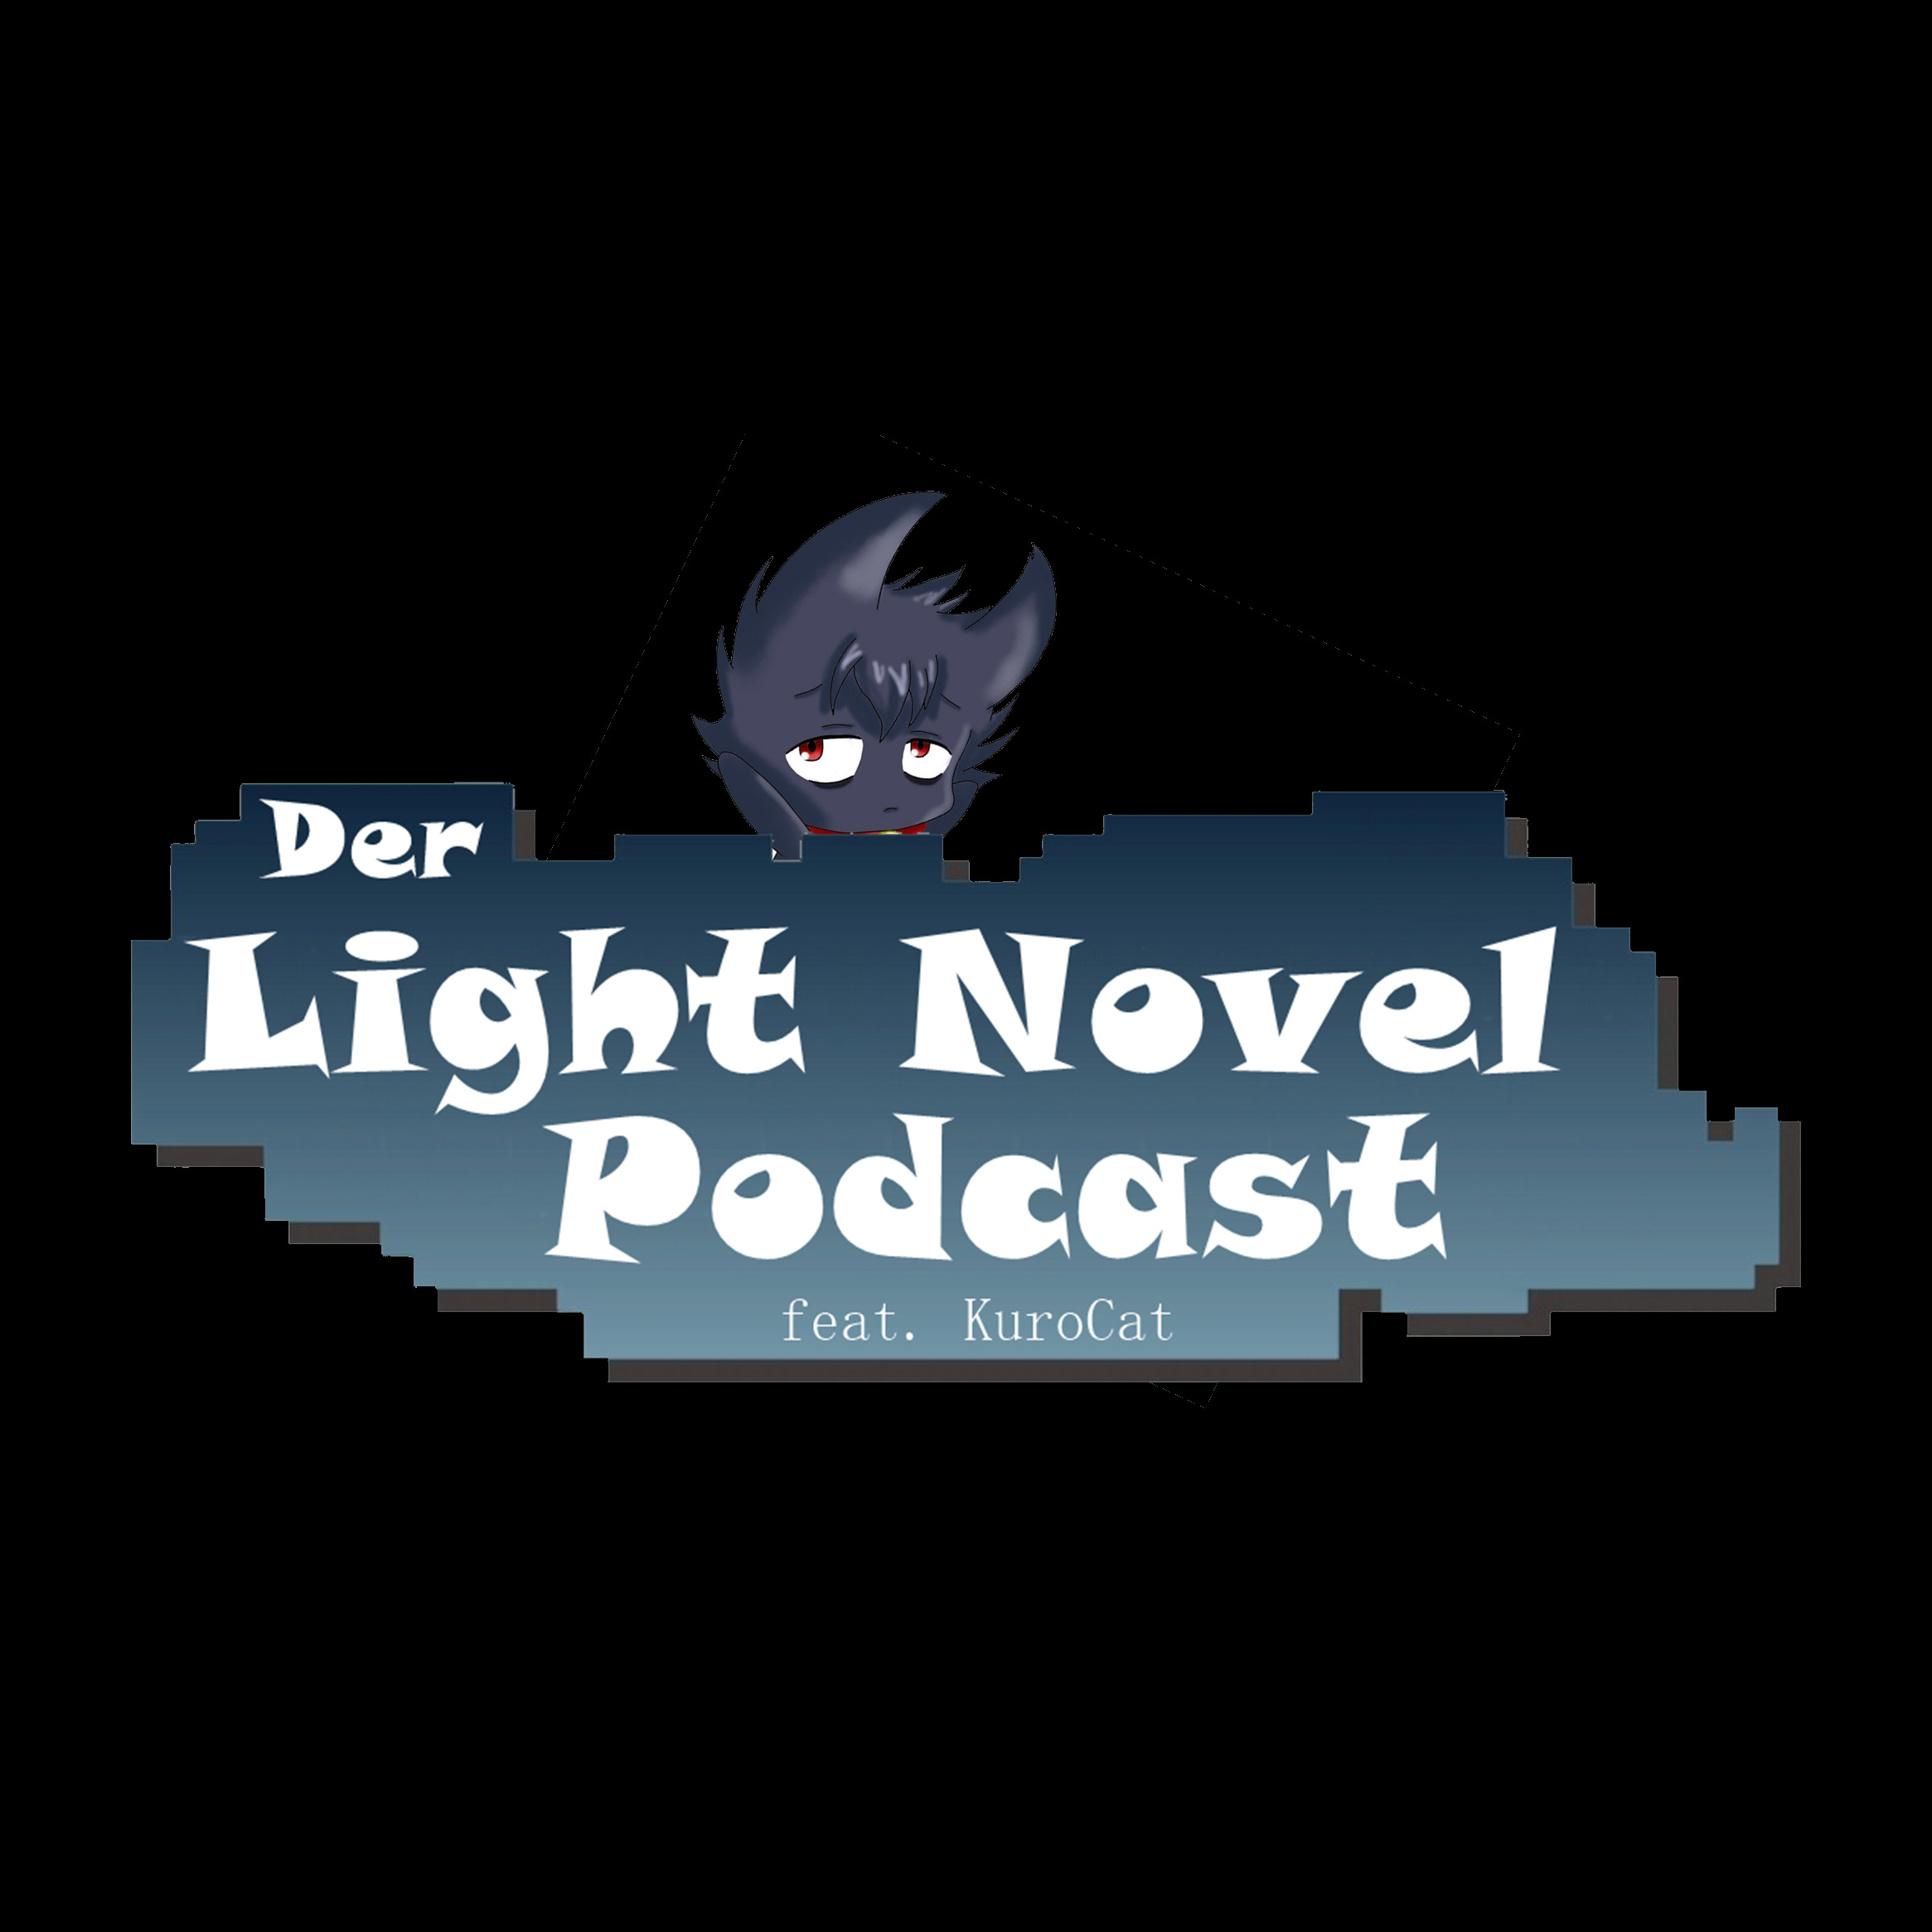 Der Light Novel Podcast